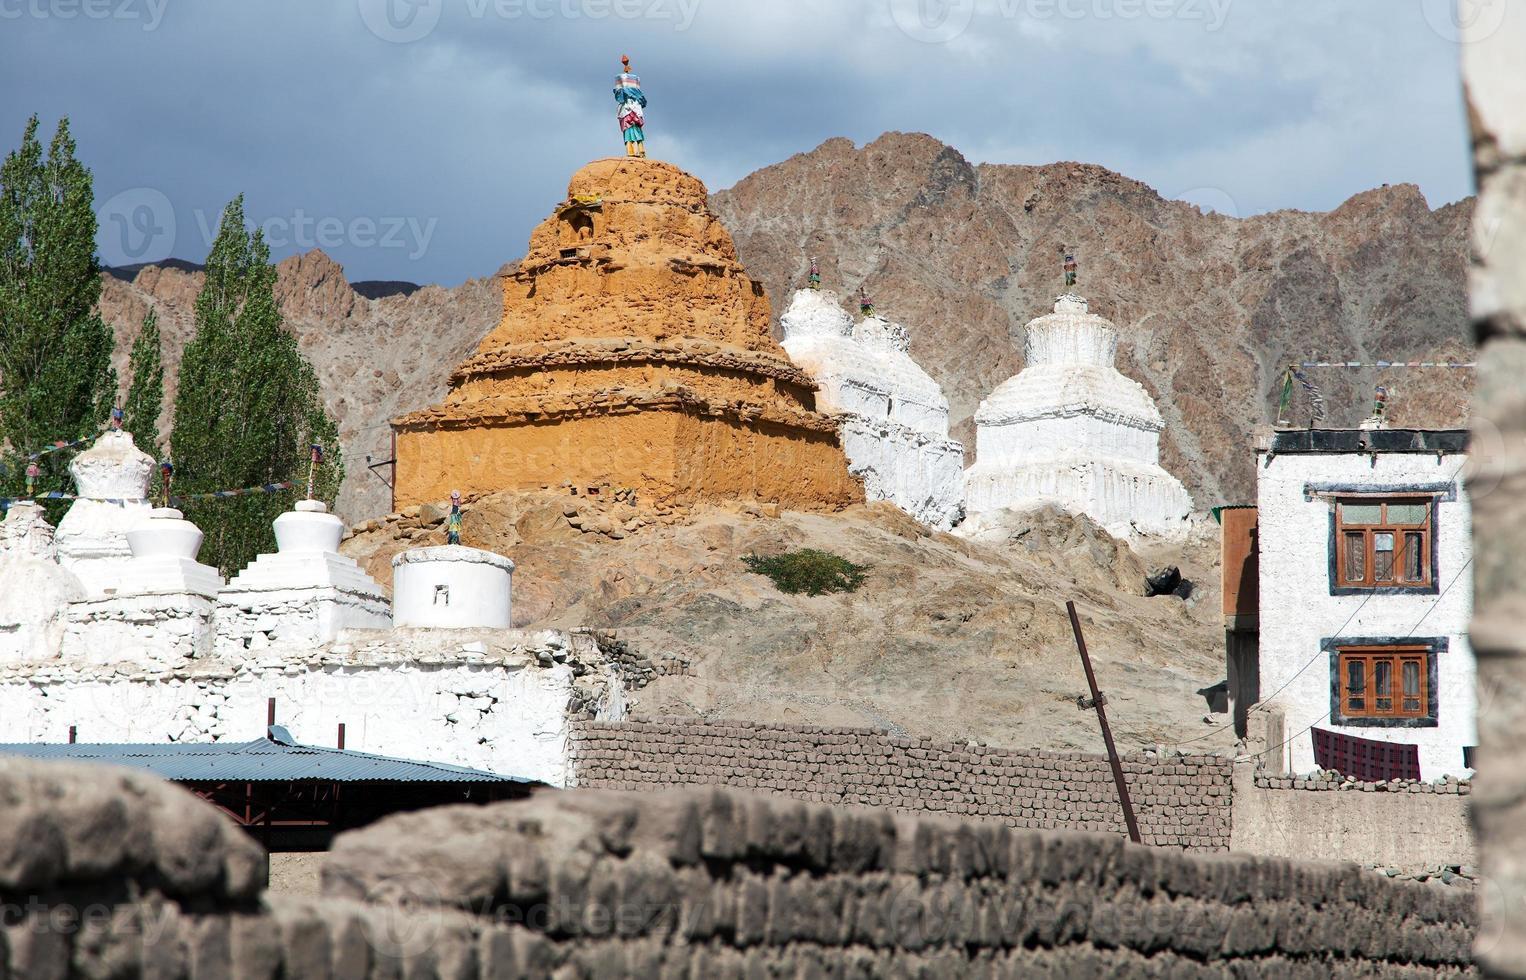 Stupas in Leh - Ladakh - Jammu and Kashmir - India photo